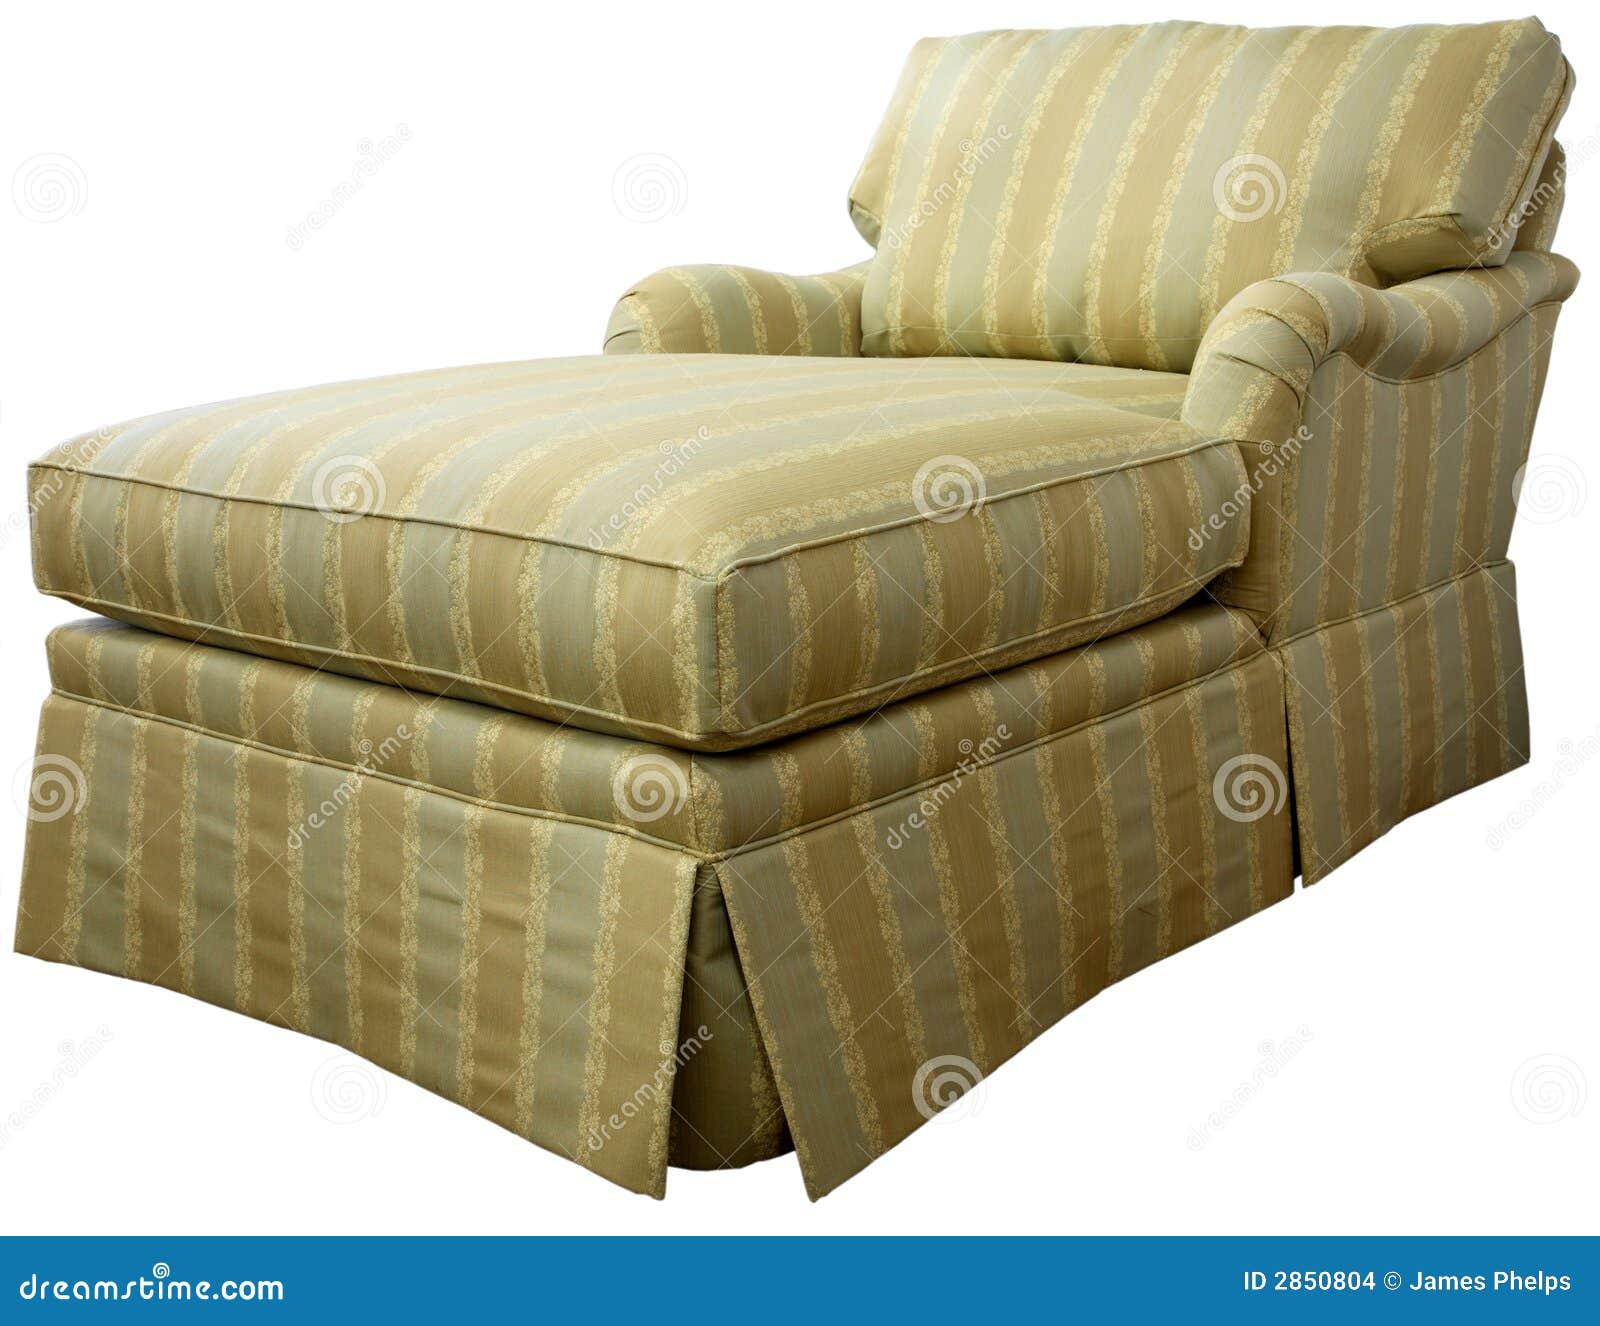 Chaise Lounge Sofa Stock Image